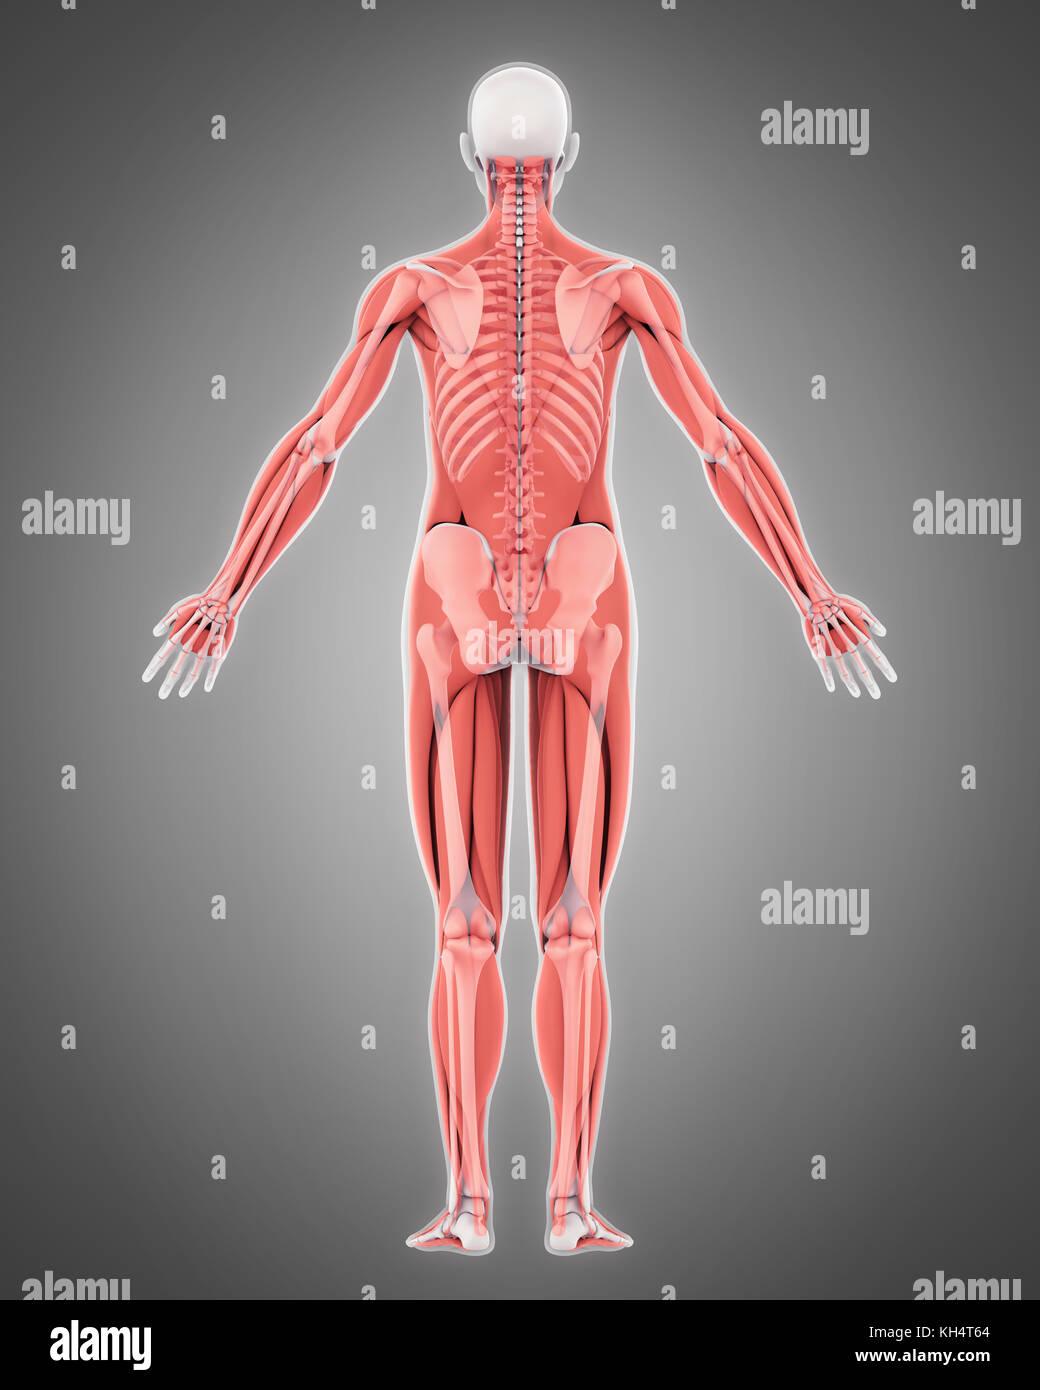 Abdominal muscular anatomy